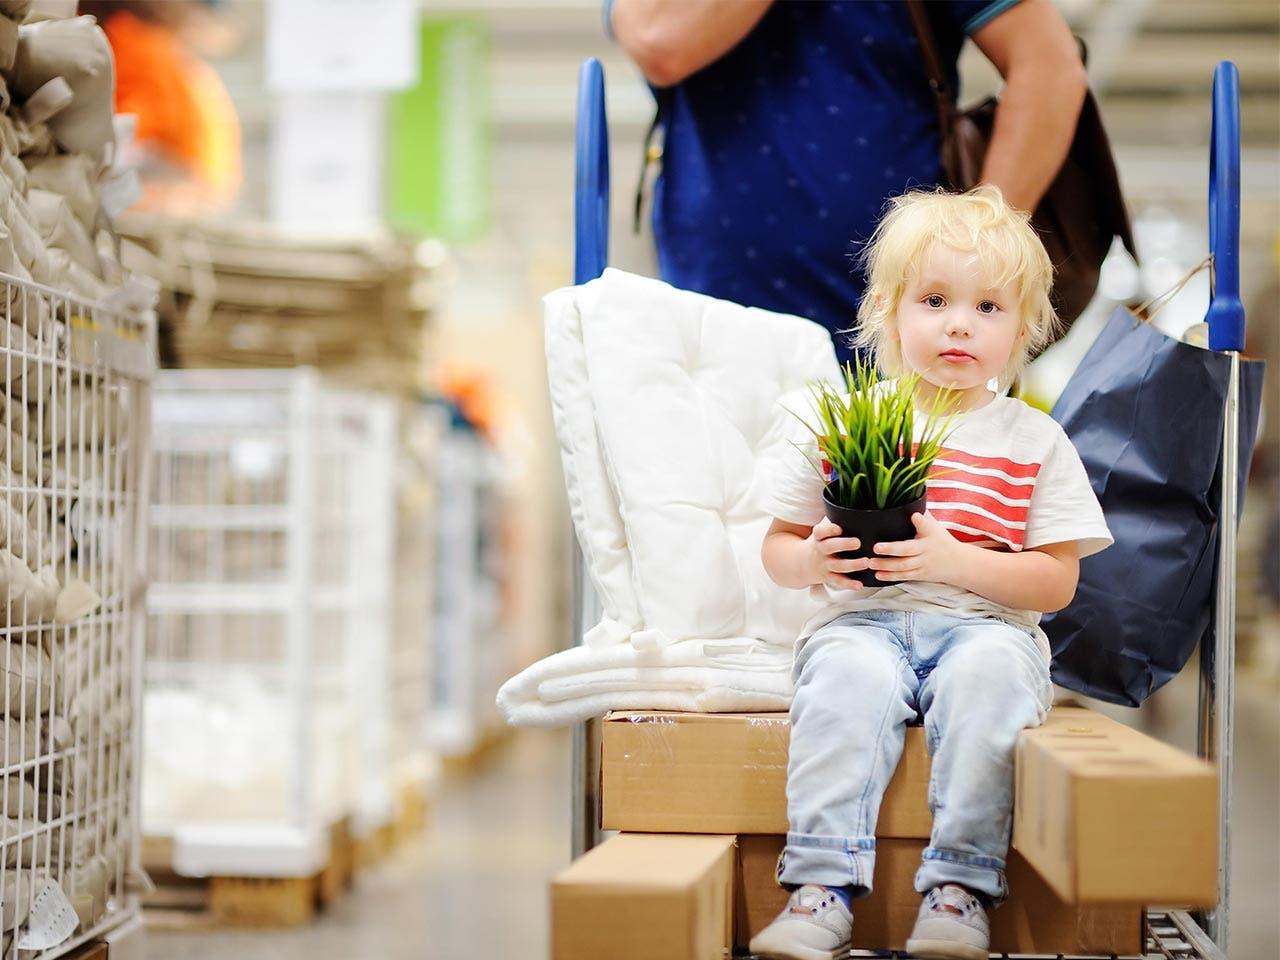 'Green Monday' deals| Maria Sbytova/Shutterstock.com